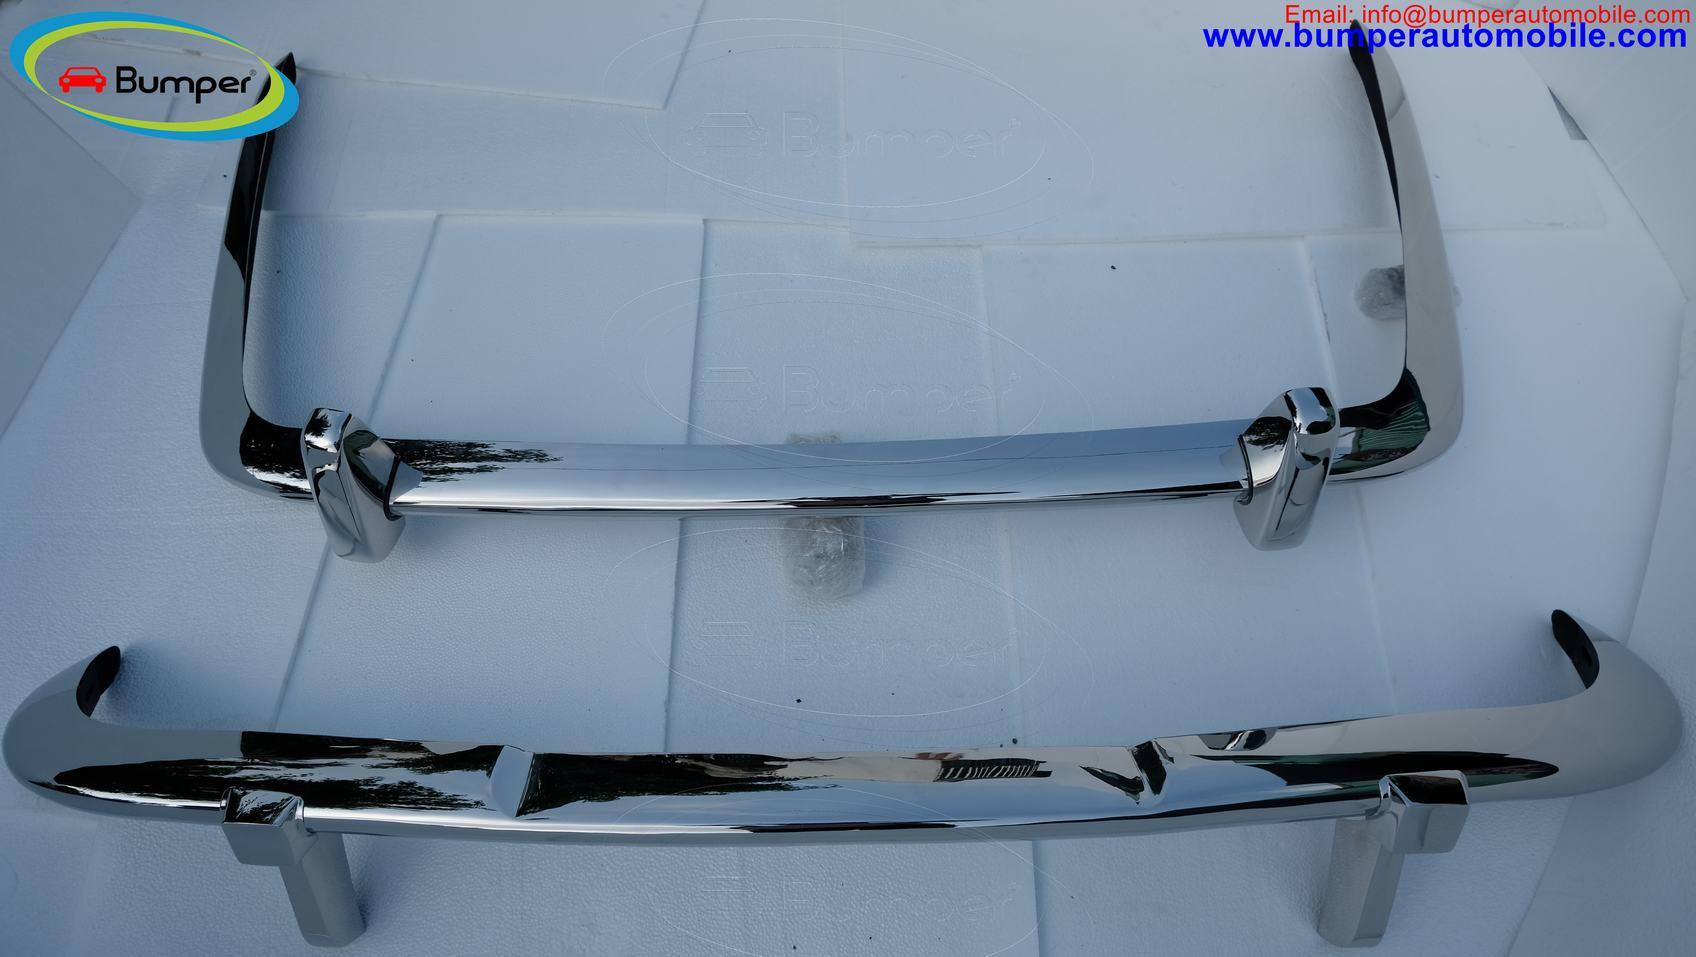 Jaguar XJ6 Series 2 bumper (1973-1979) by stainless steel